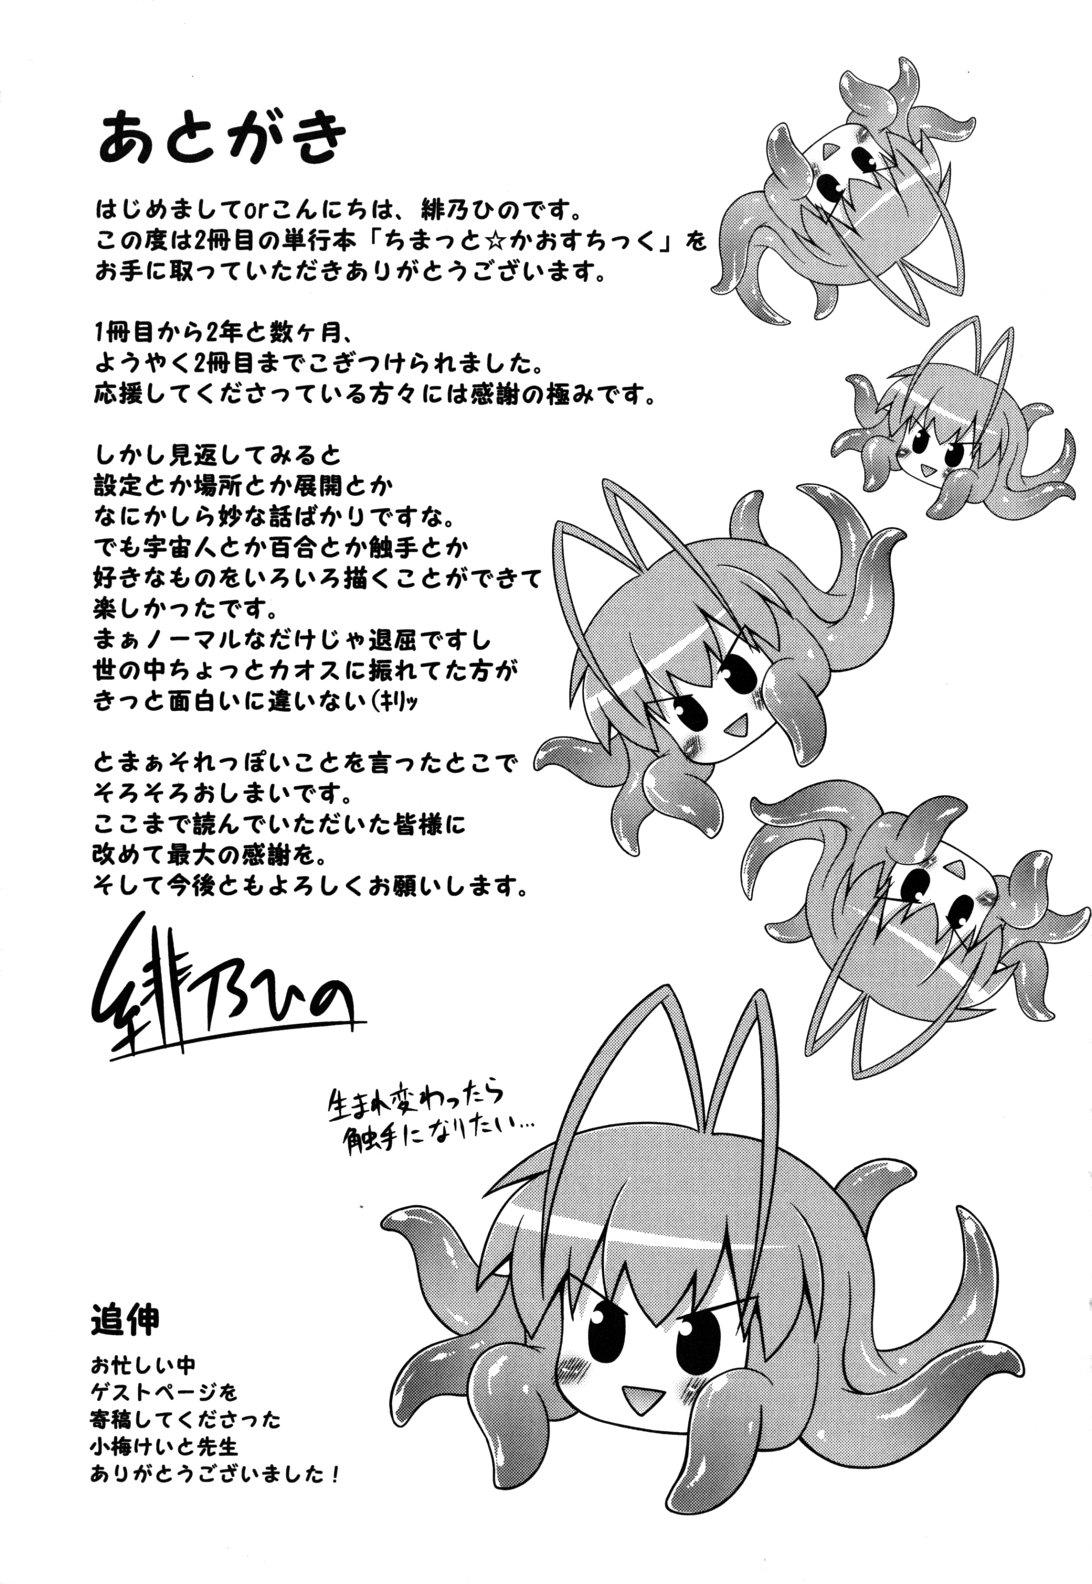 Chimatto Chaos Chikku 207